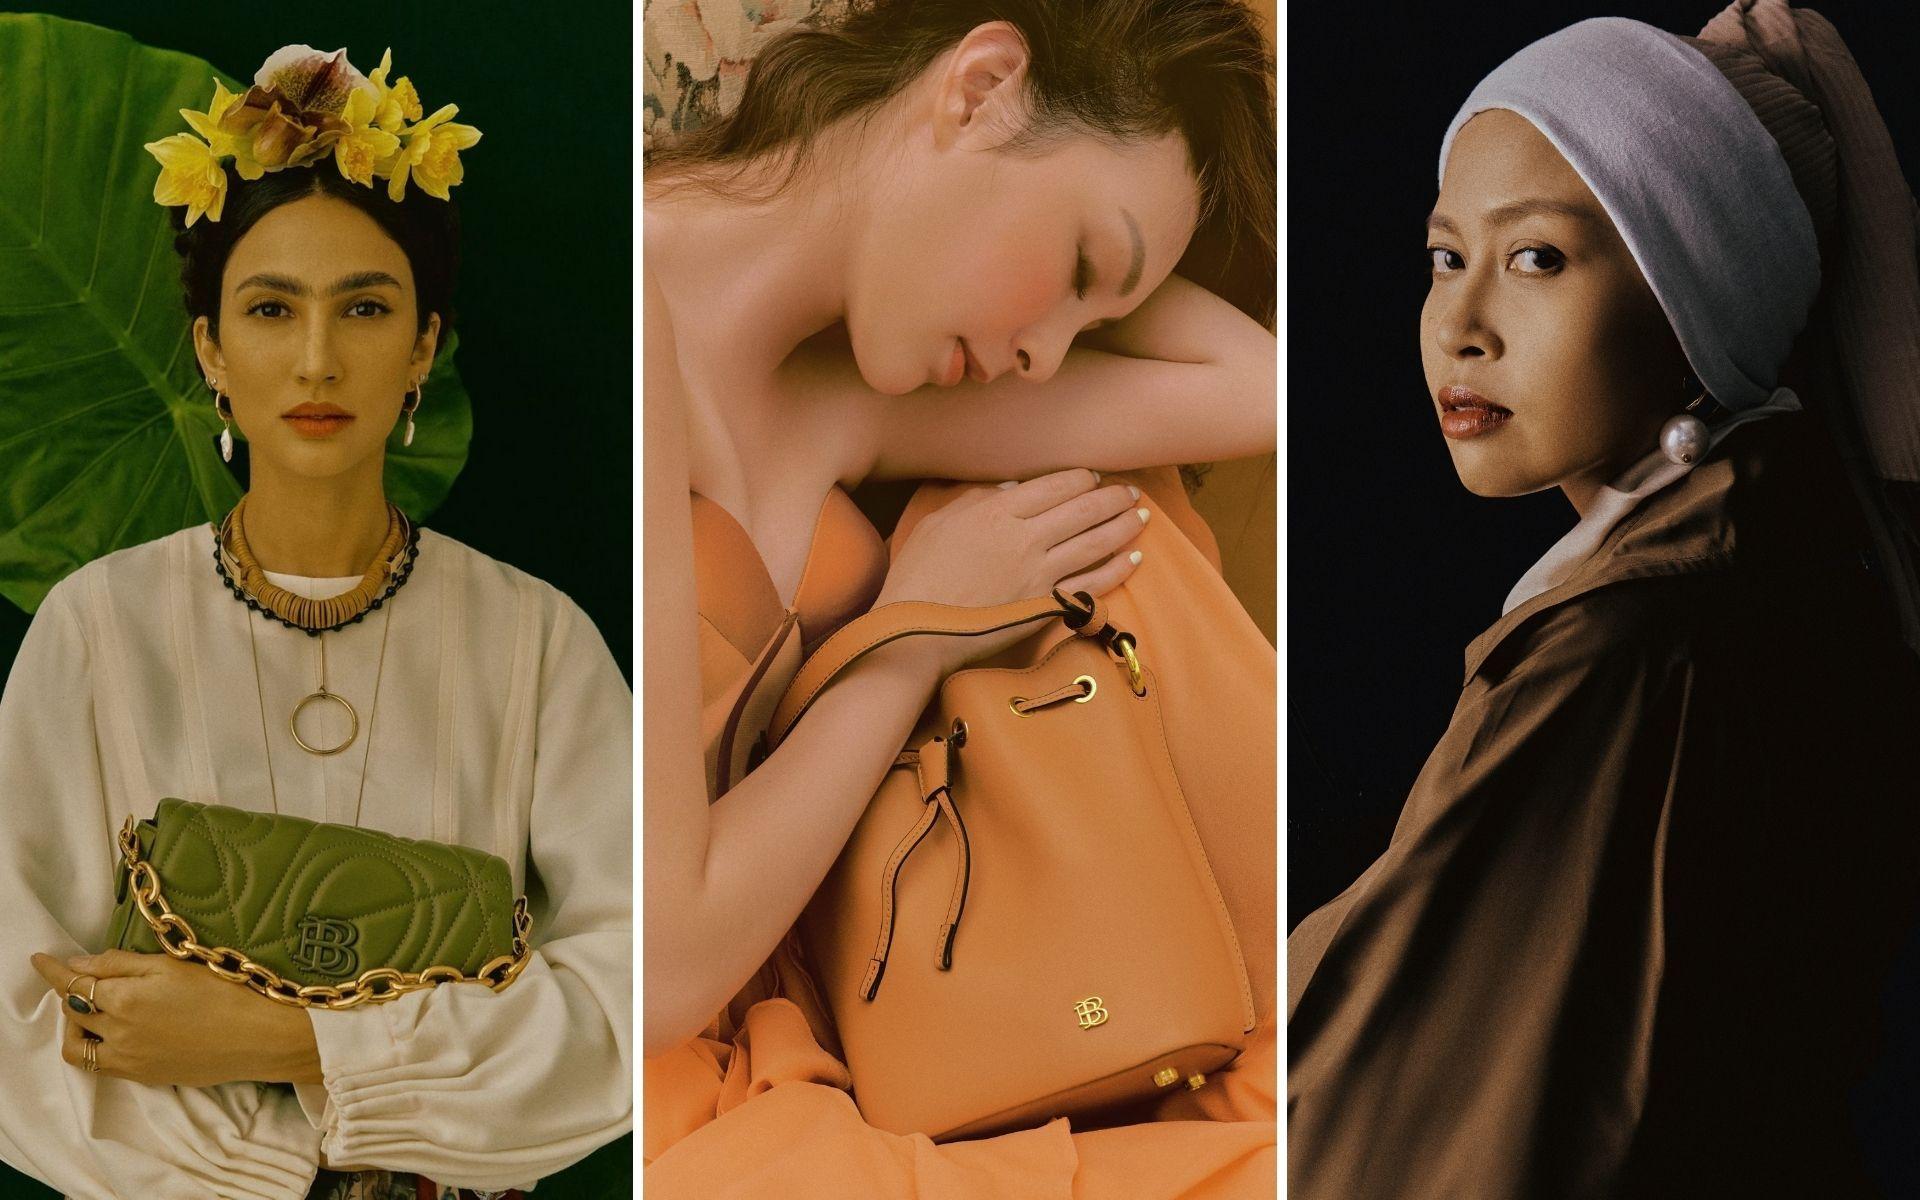 Bonia x International Women's Day: Inspiring Quotes By Women We Love